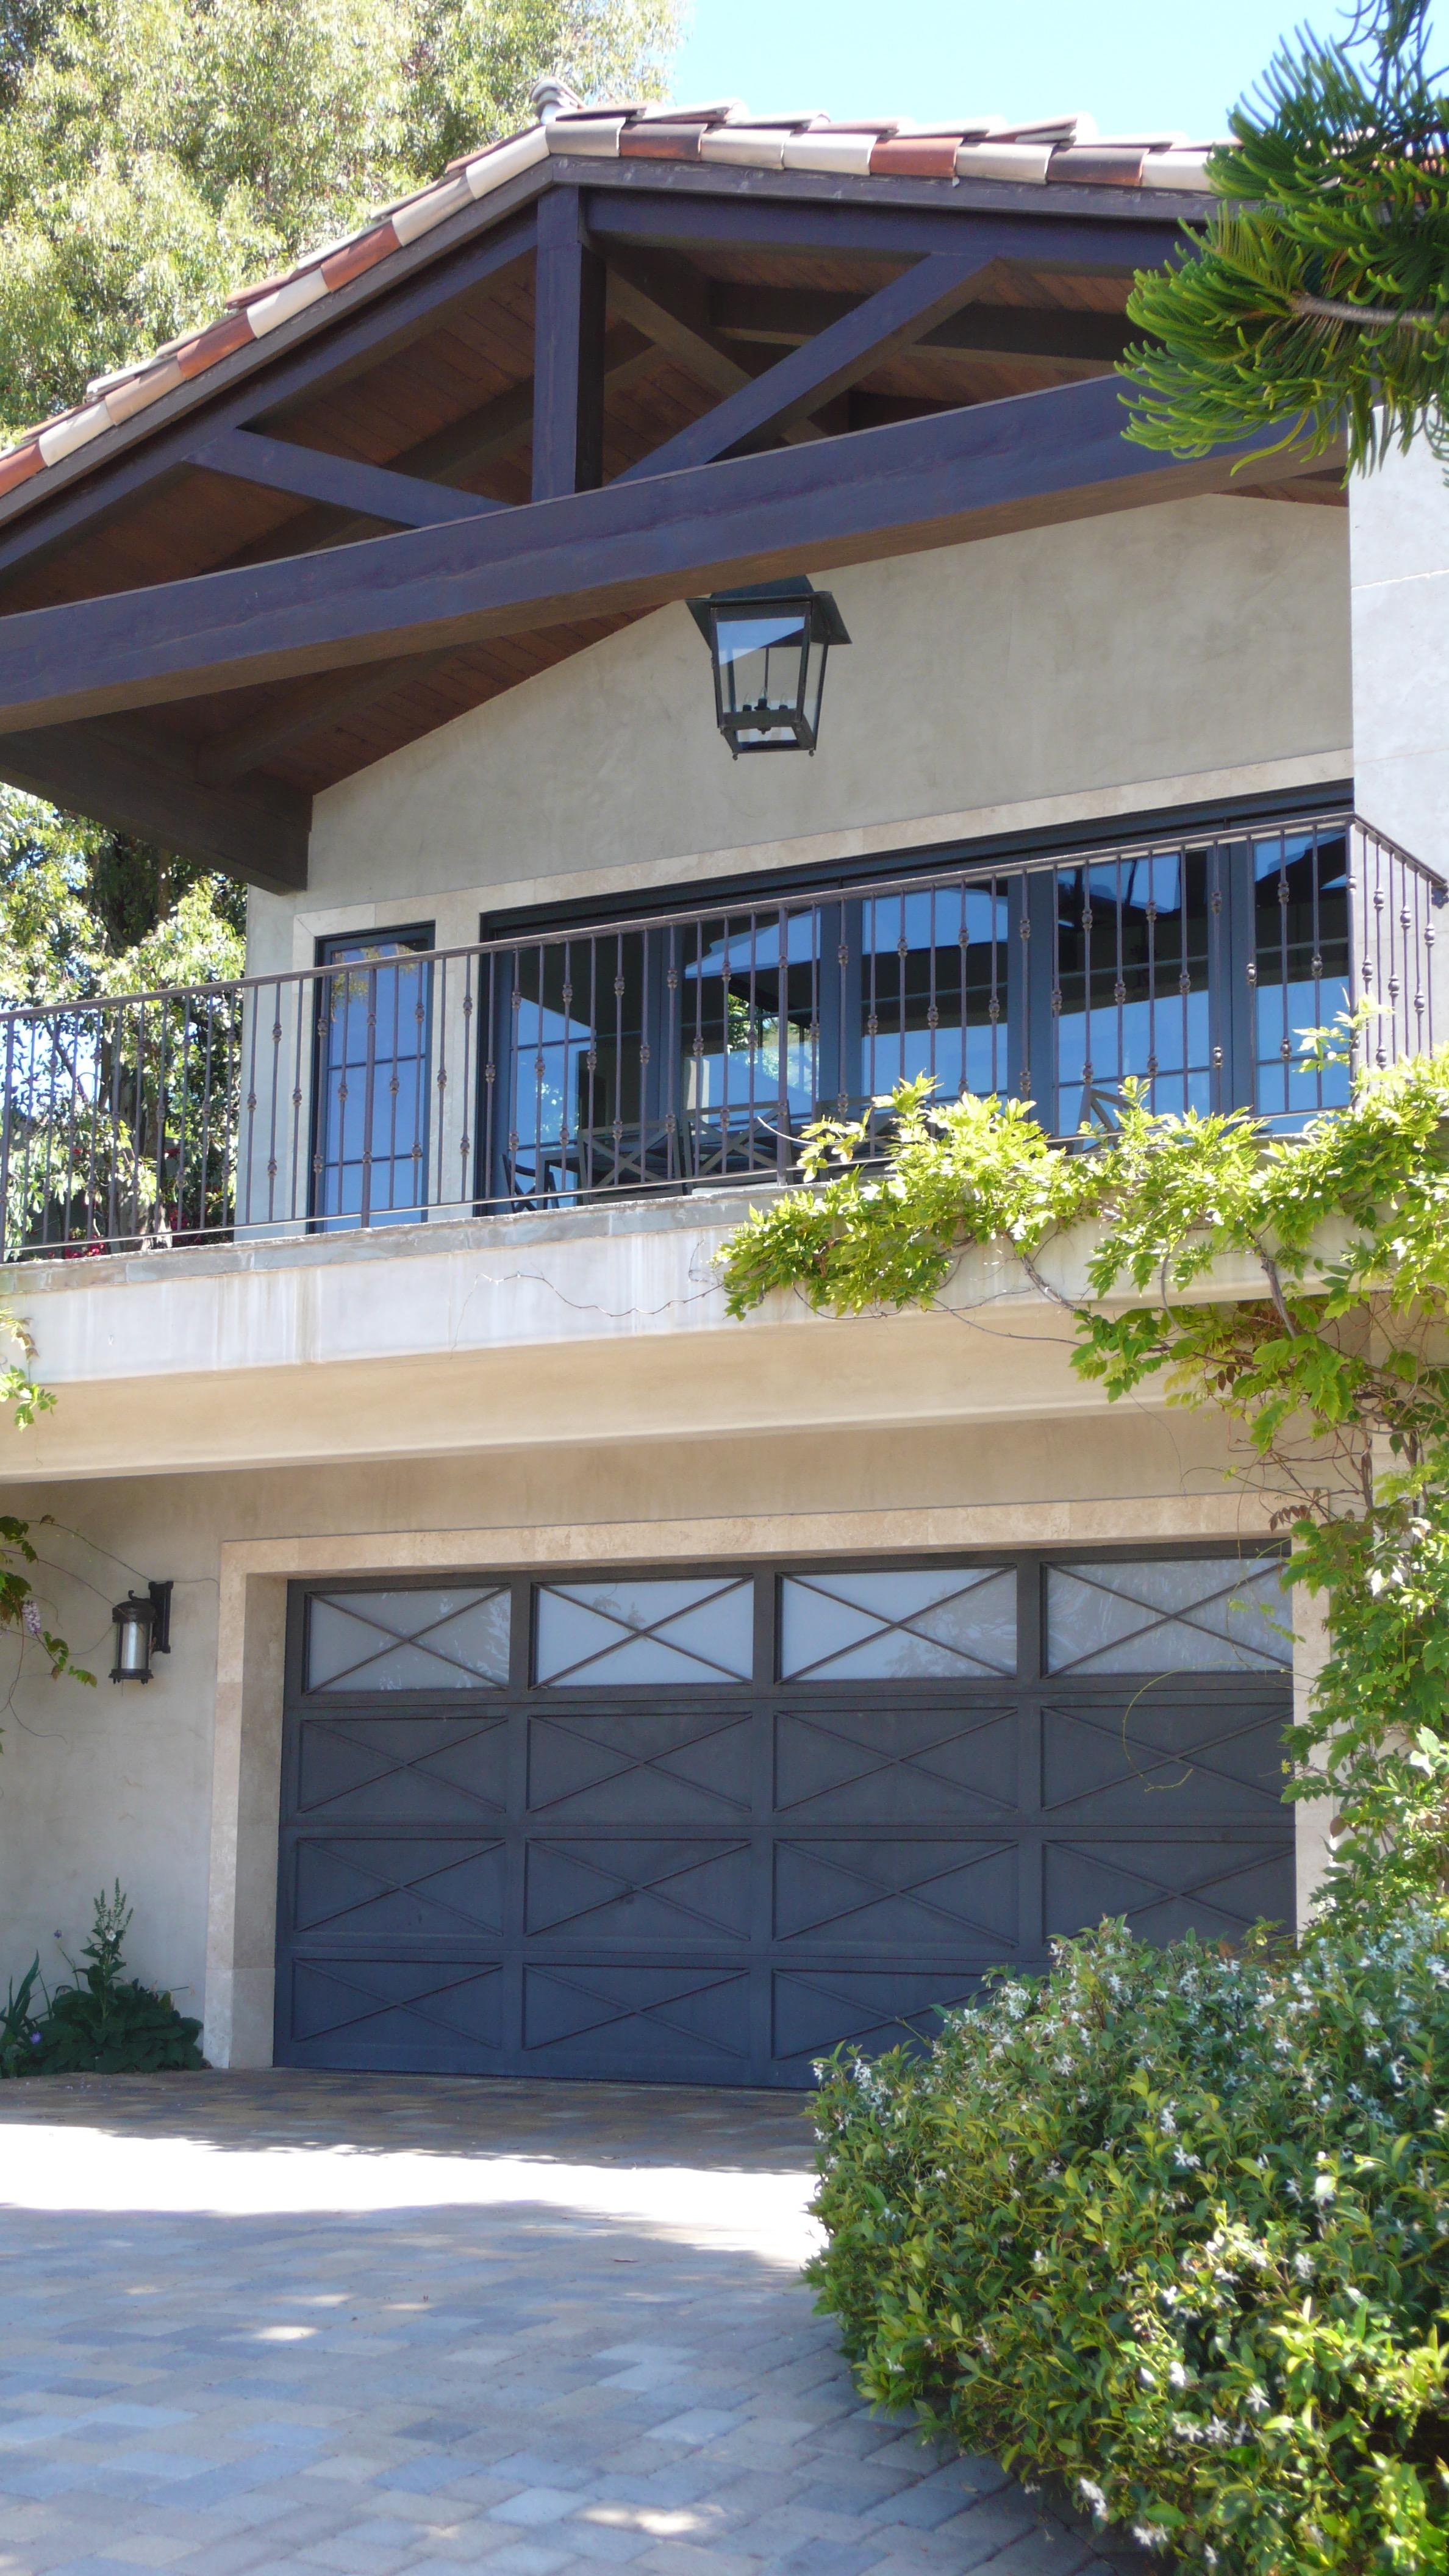 Malibu Garage Door and railing.jpg